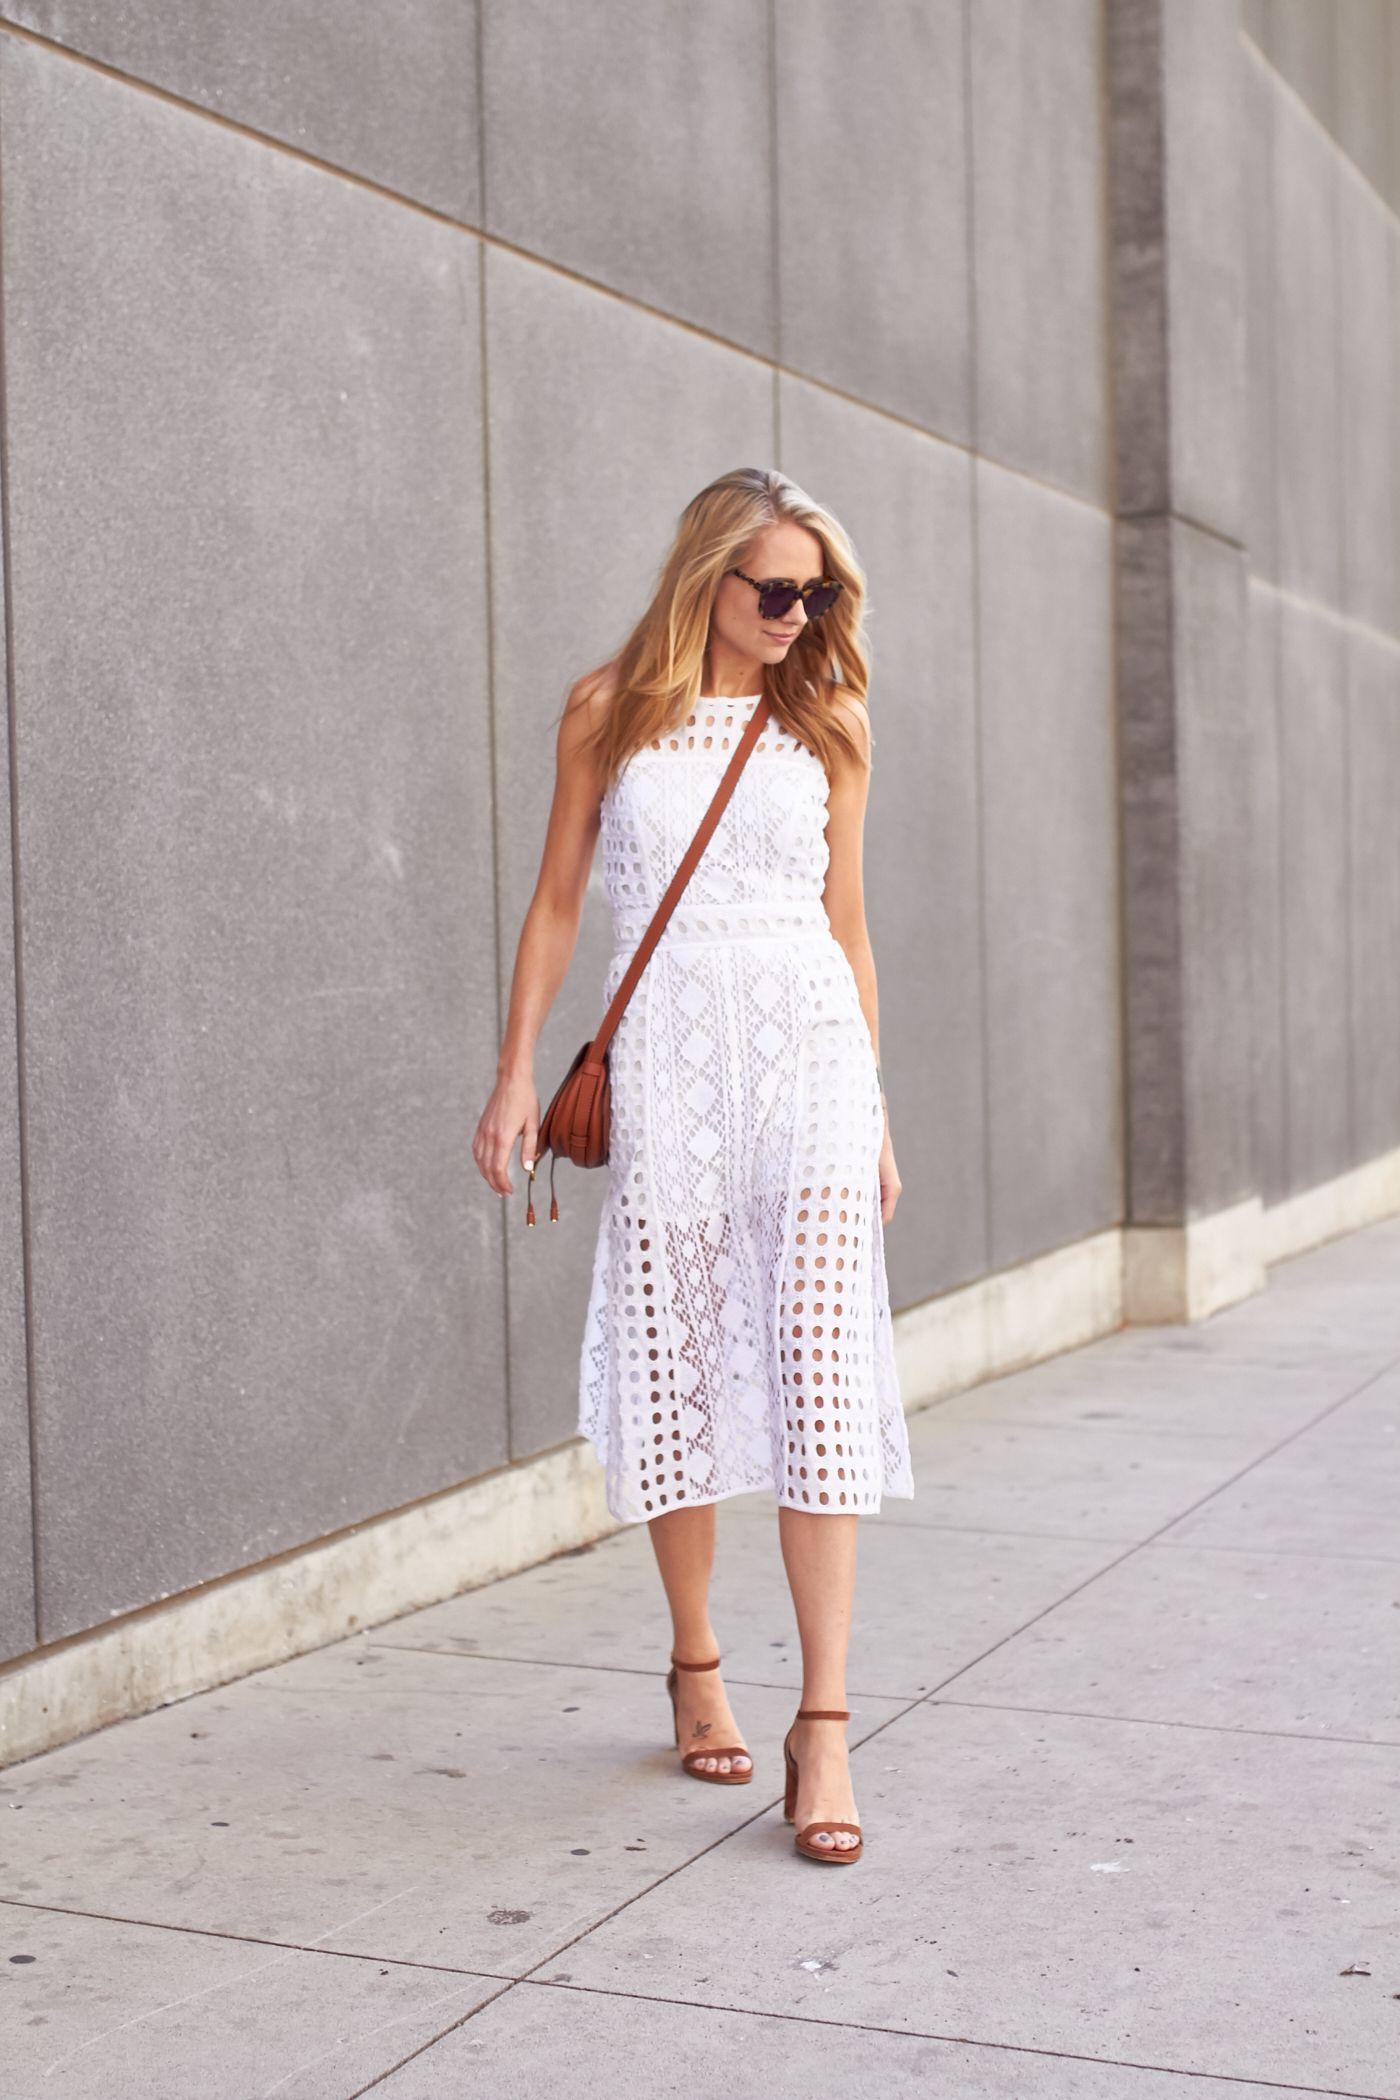 fashion-jackson-olivia-palermo-patchwork-lace-midi-dress- 4b8717e86